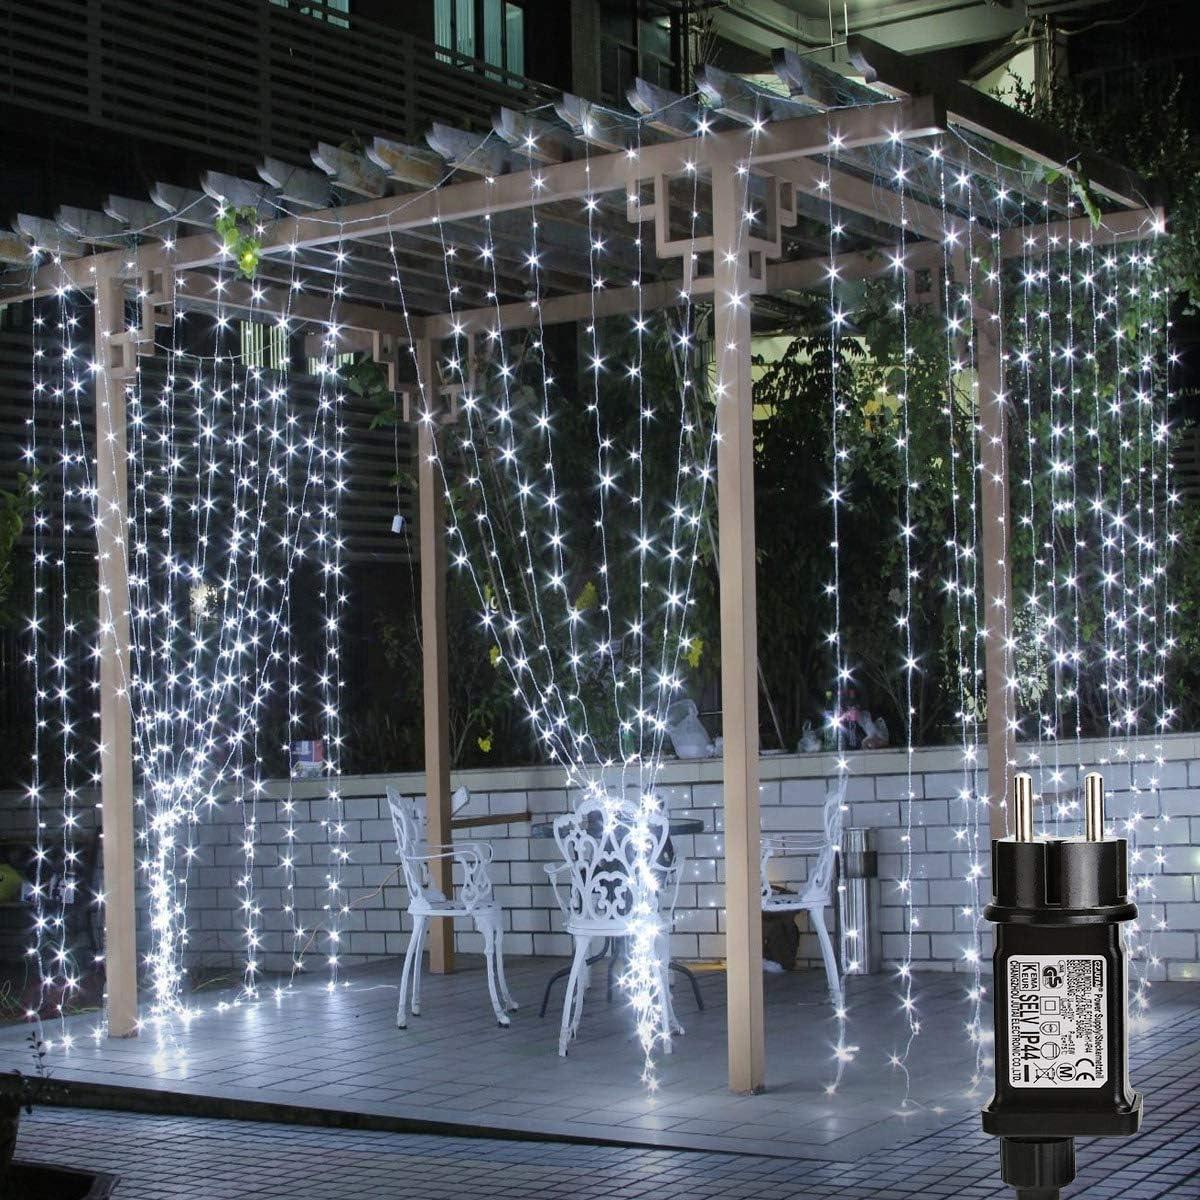 Lepro Cortina de Luces LED con Enchufe 3x3m 306 LED, Luz Decorativa Interior y Exterior Blanco Frío, Impermeable, Cadena de Luces 8 Modos Luz, ...